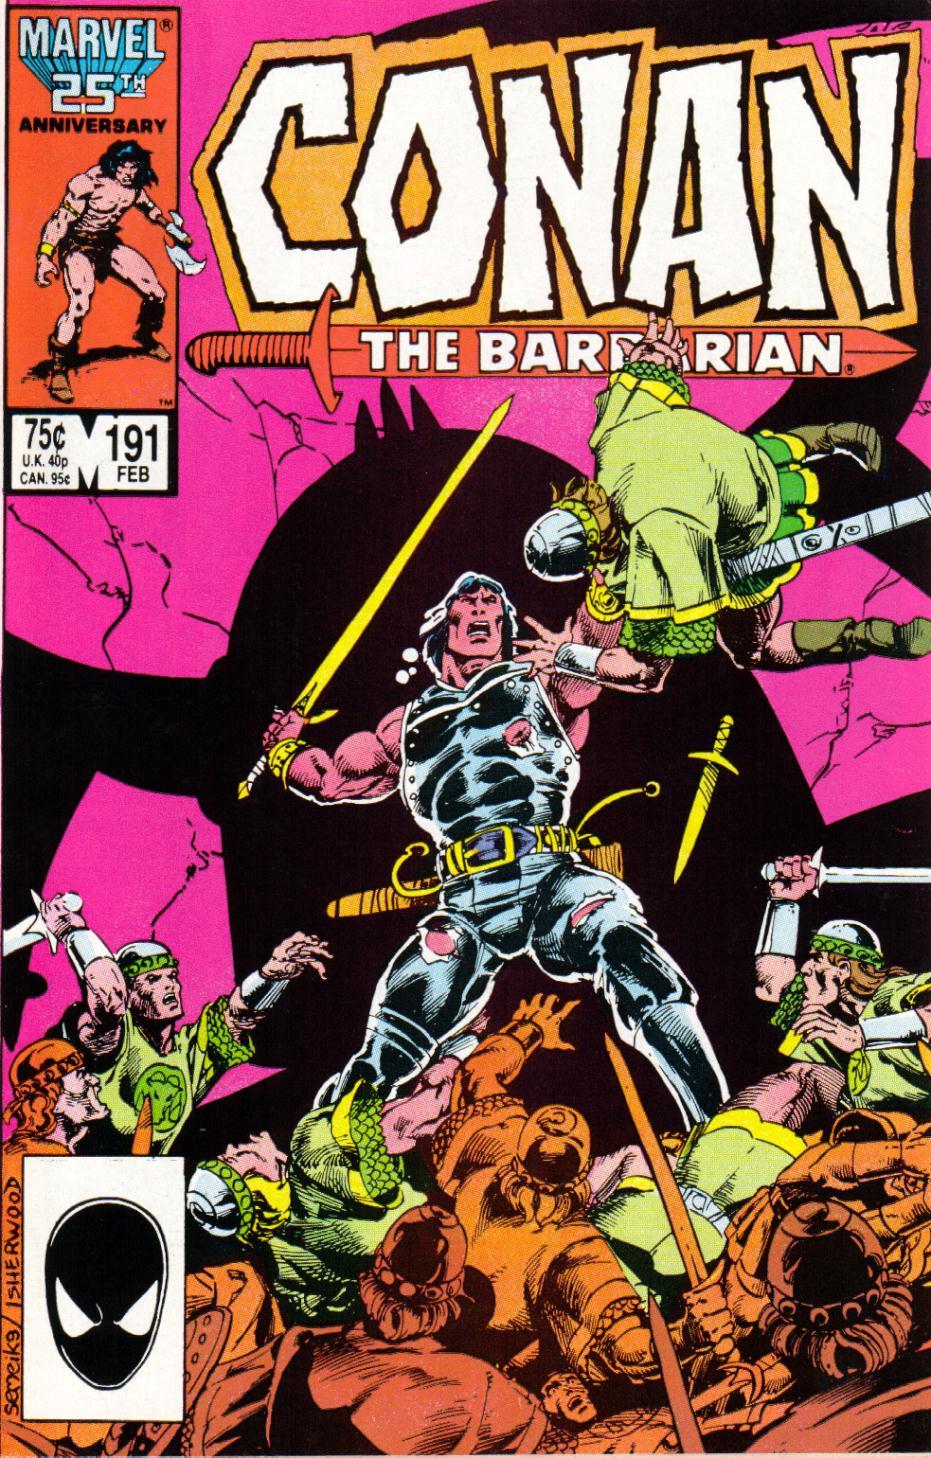 Conan the Barbarian 191